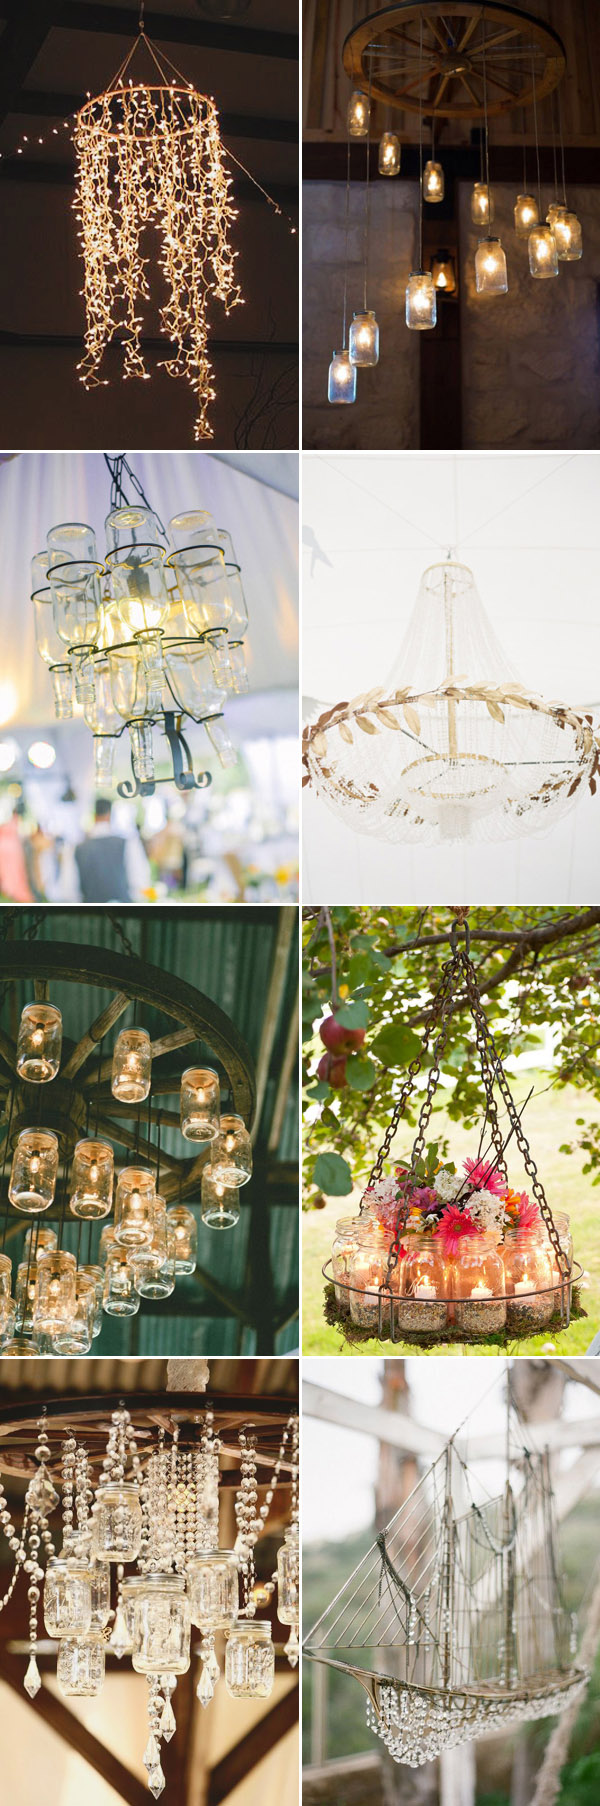 Unique Diy Chandeliers For Wedding Decoration Ideas